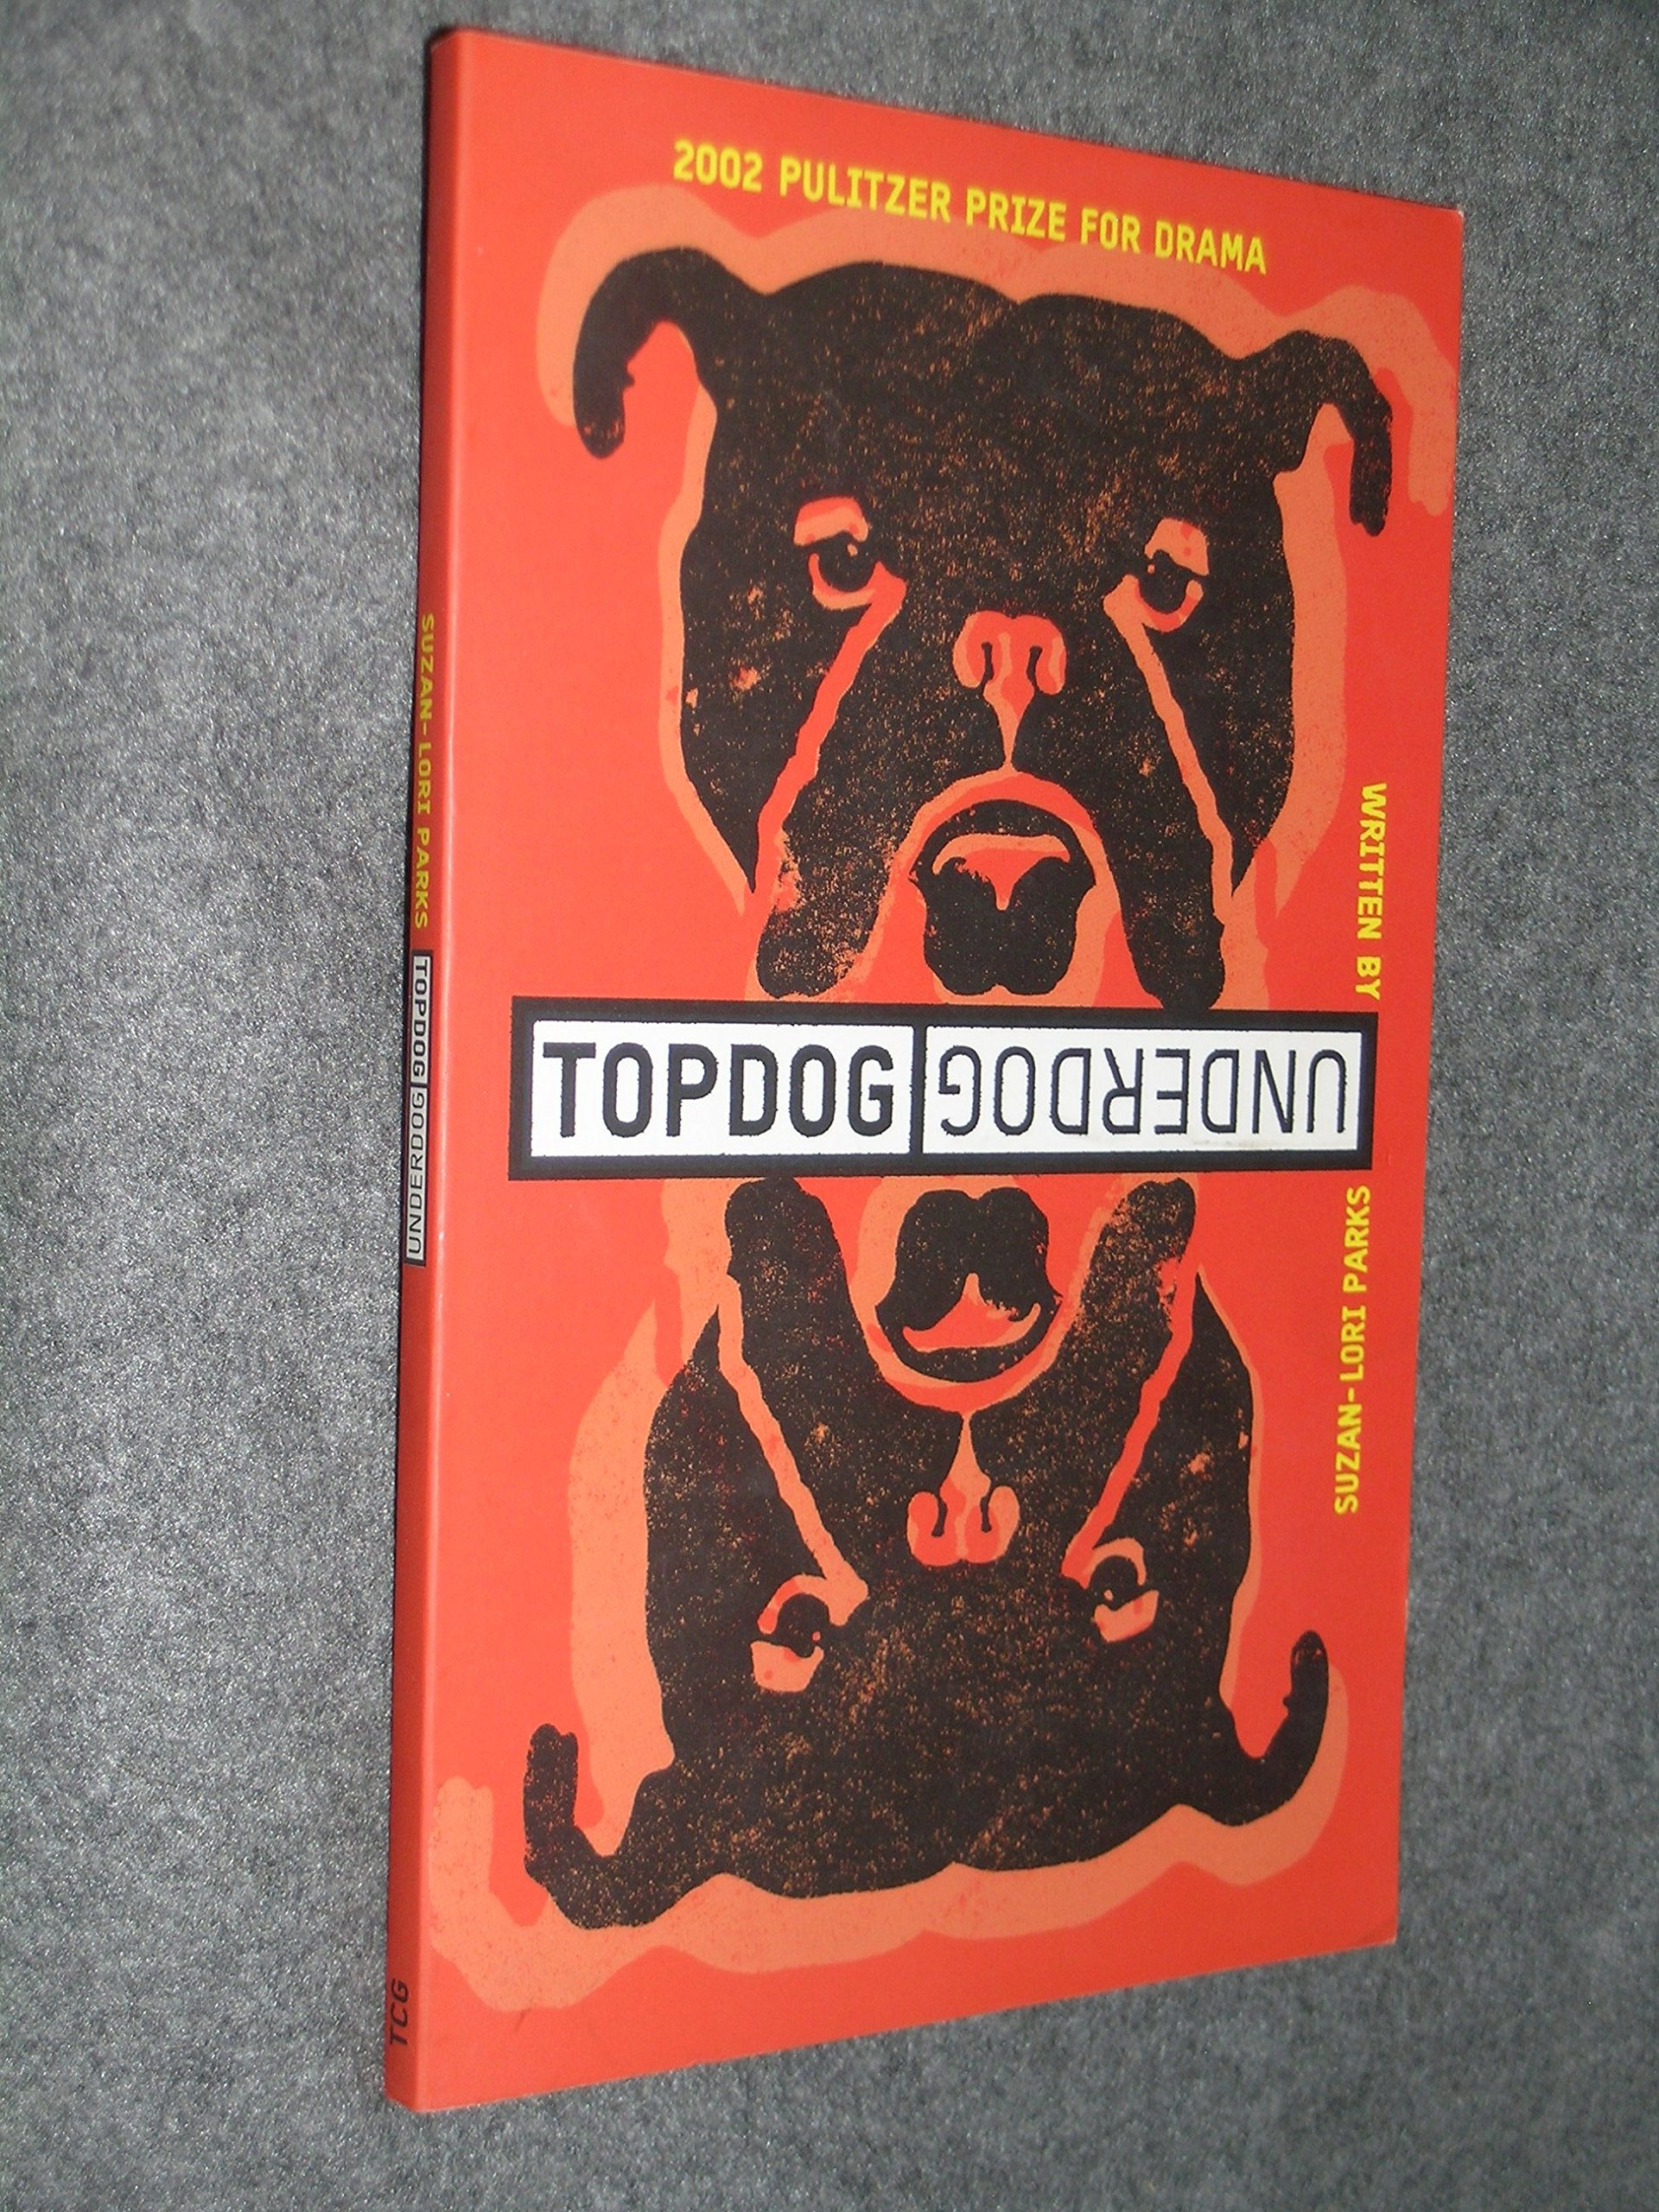 By Suzan Lori Parks Topdog Underdog 1st Edition 5 1 2002 Suzan Lori Parks 8601406574175 Amazon Com Books